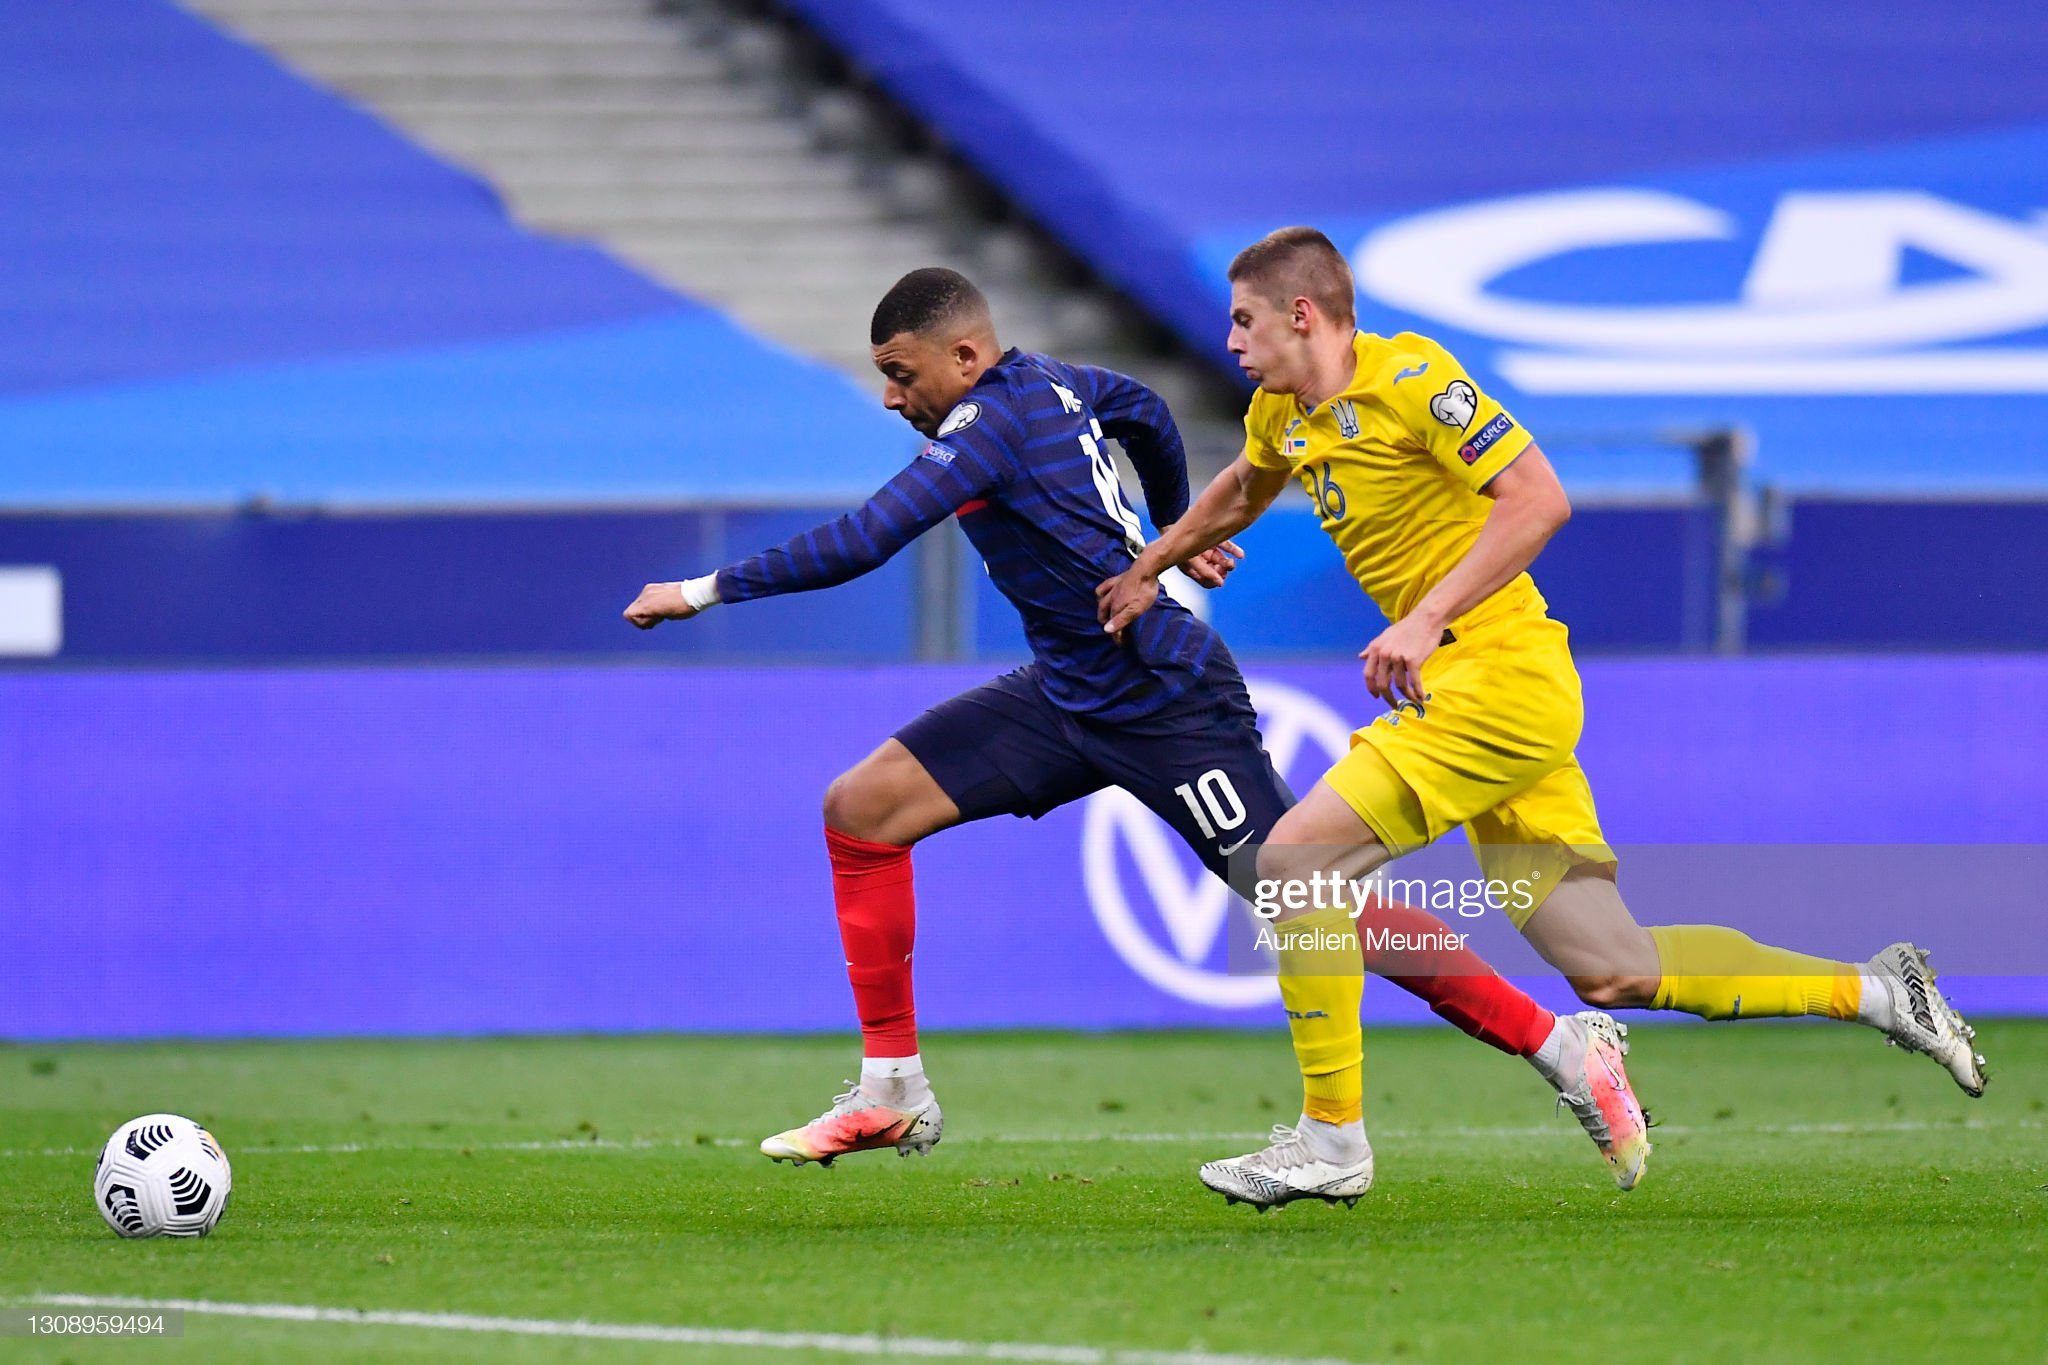 Ukraine vs France Preview, prediction and odds